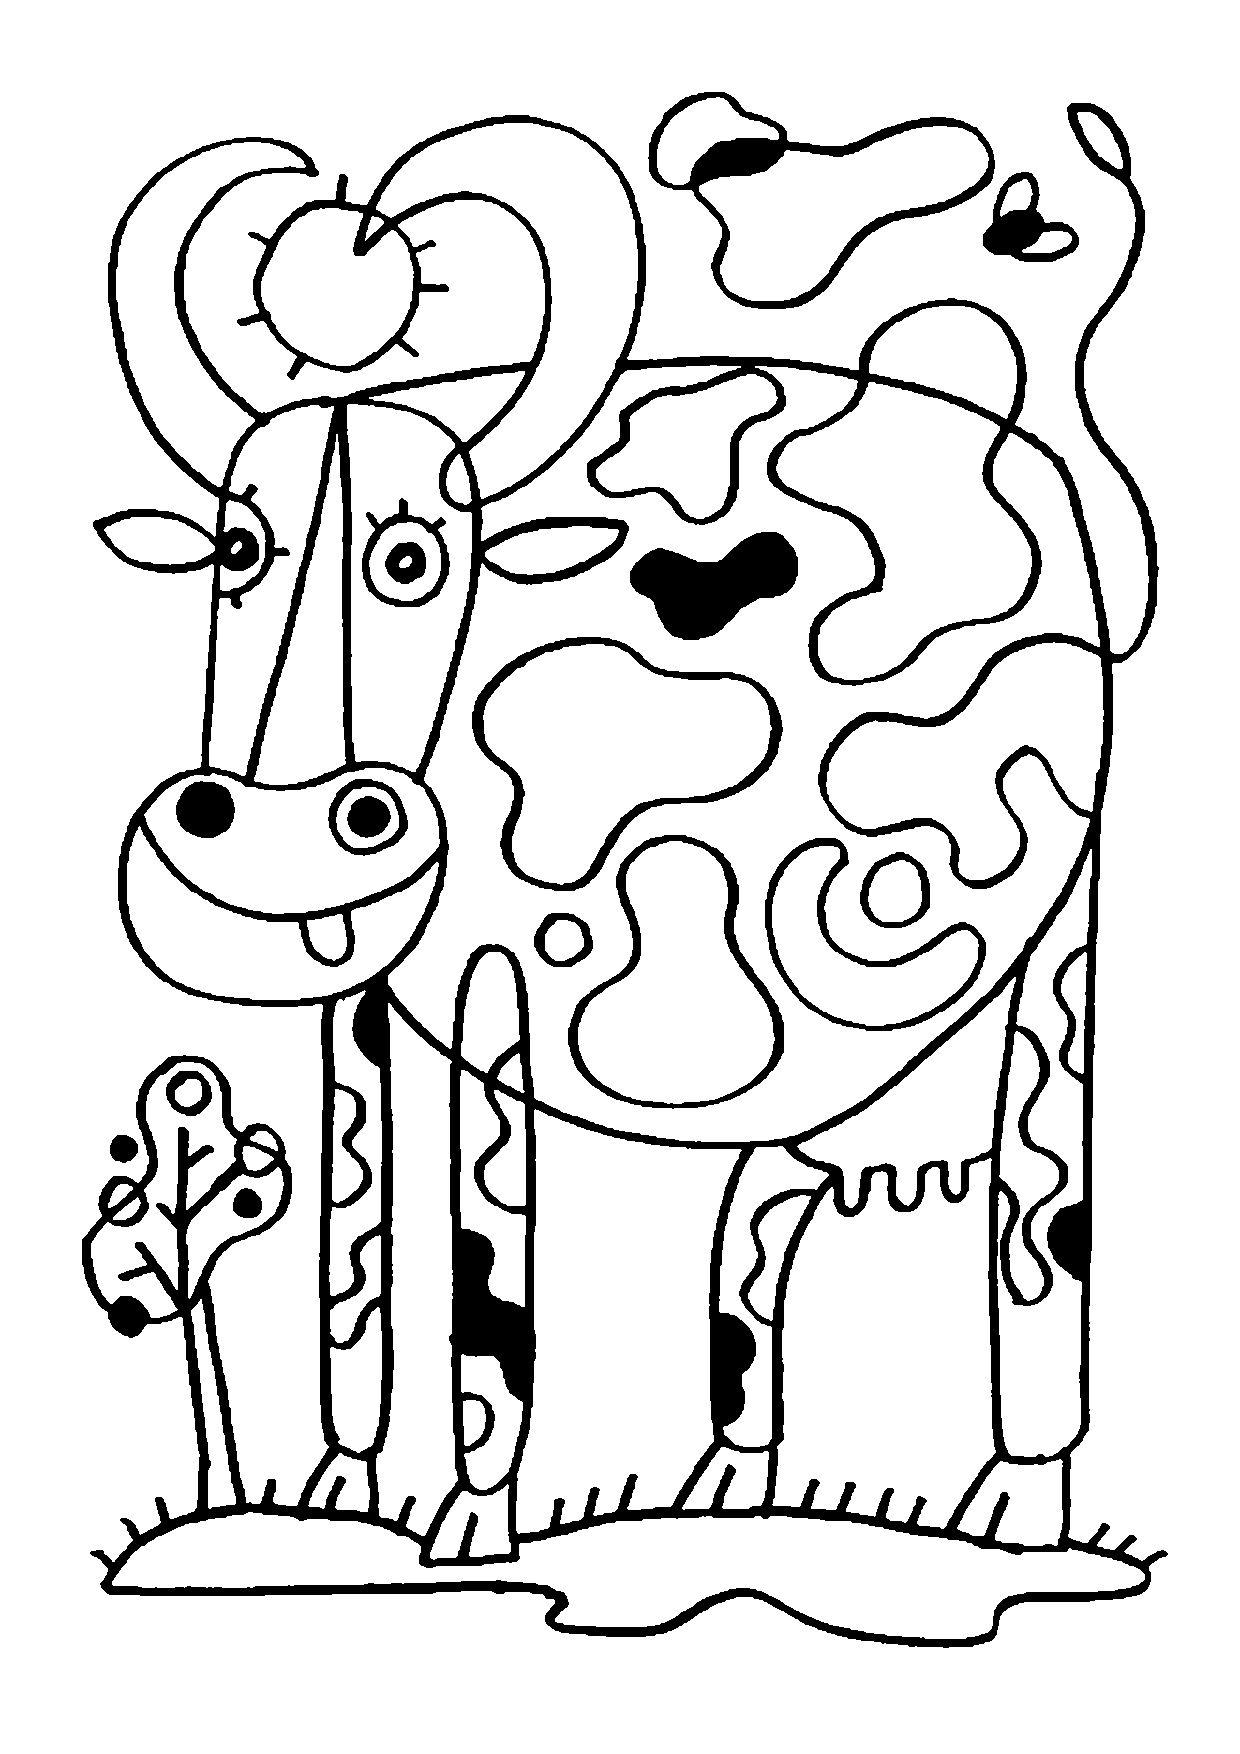 Coloriage Animaux Vache.Coloriage Animaux Vache C Frederic Sochard Coloriages Arabic